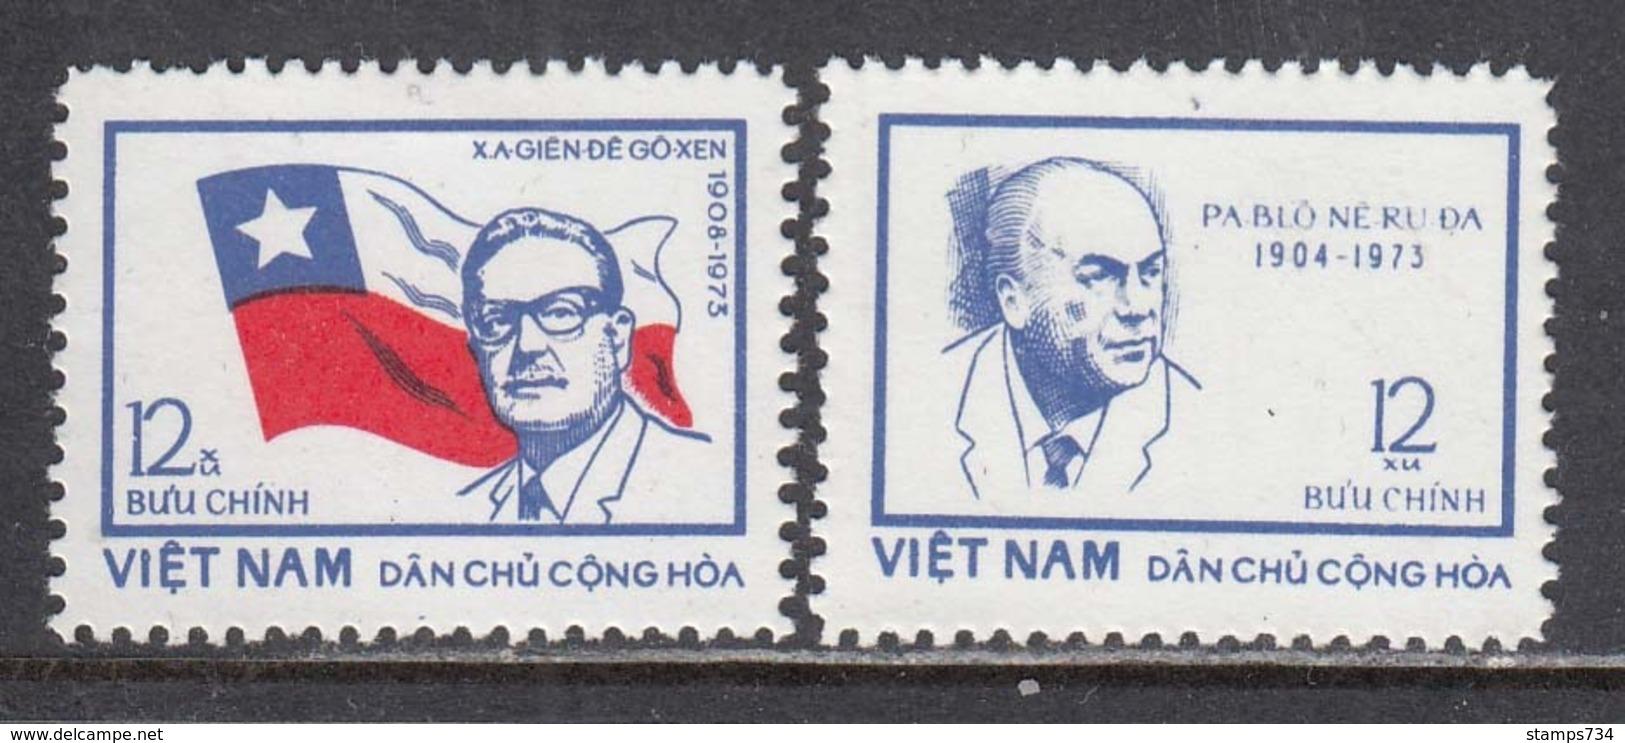 Vietnam Nord 1974 - Salvador Aliende And Pablo Neruda, Mi-Nr. 778/79, MNH** - Vietnam